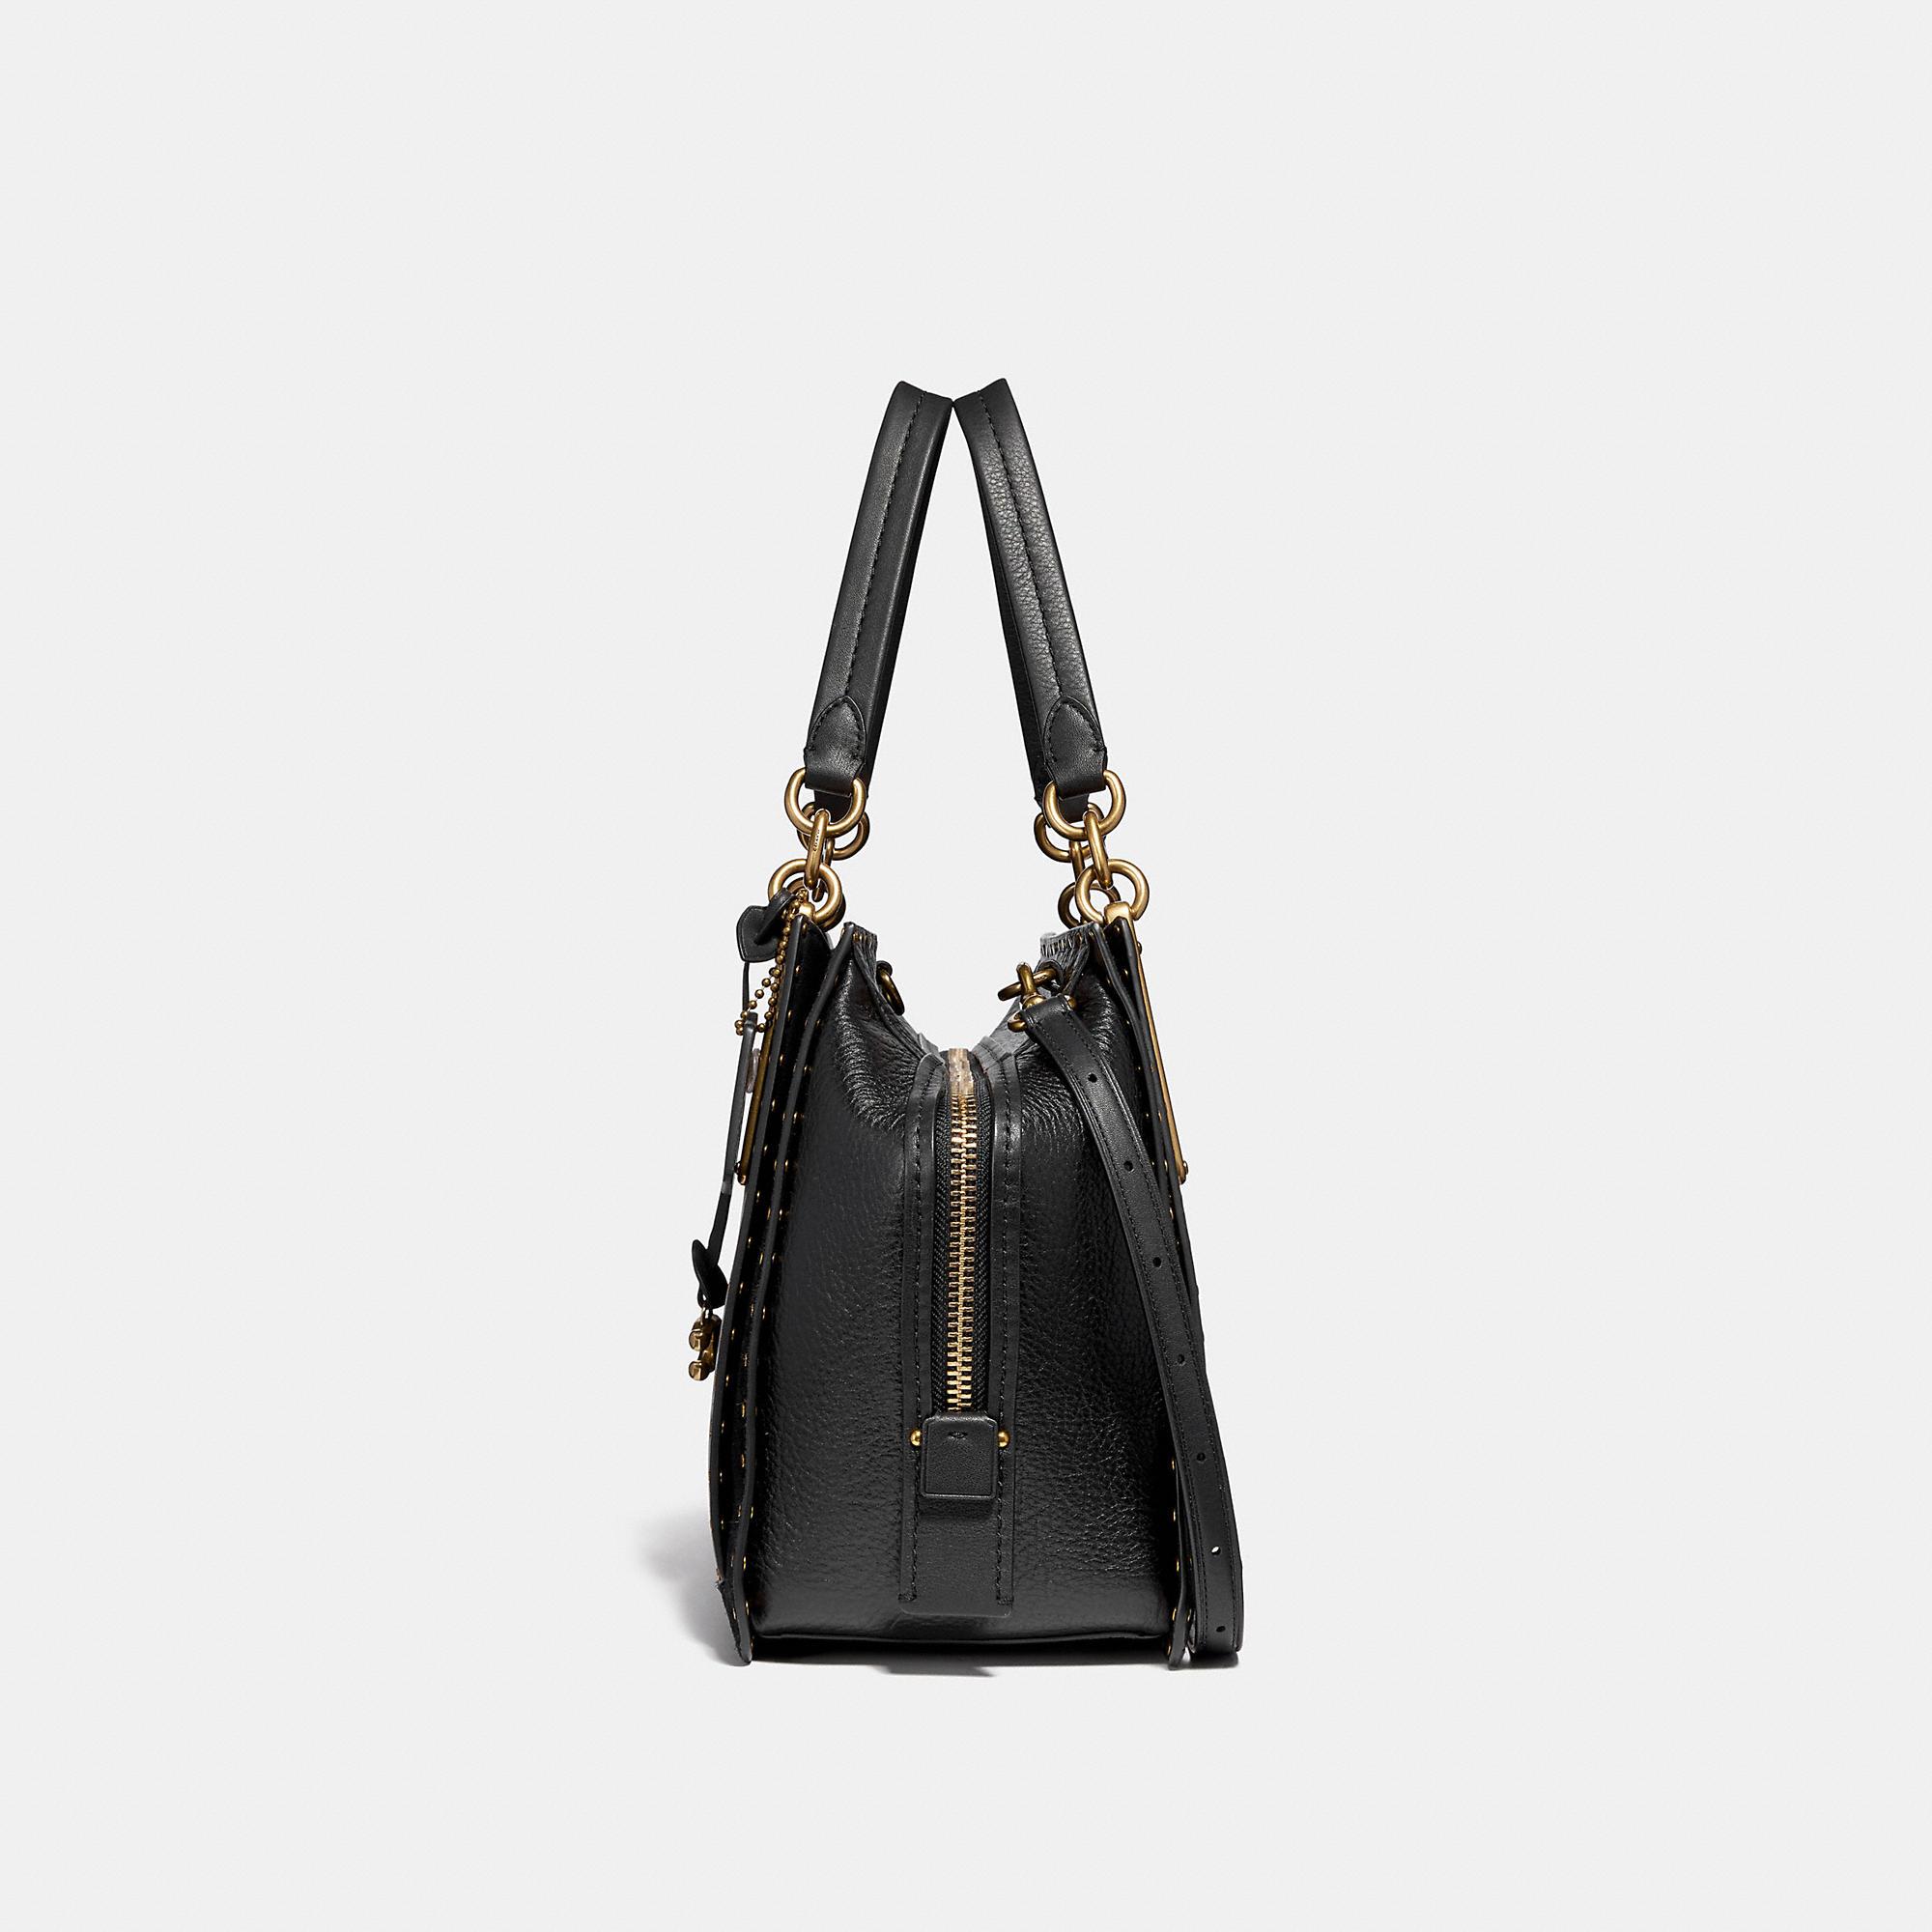 14989cabae COACH Dreamer 36 With Rivets - Women s Designer Handbags